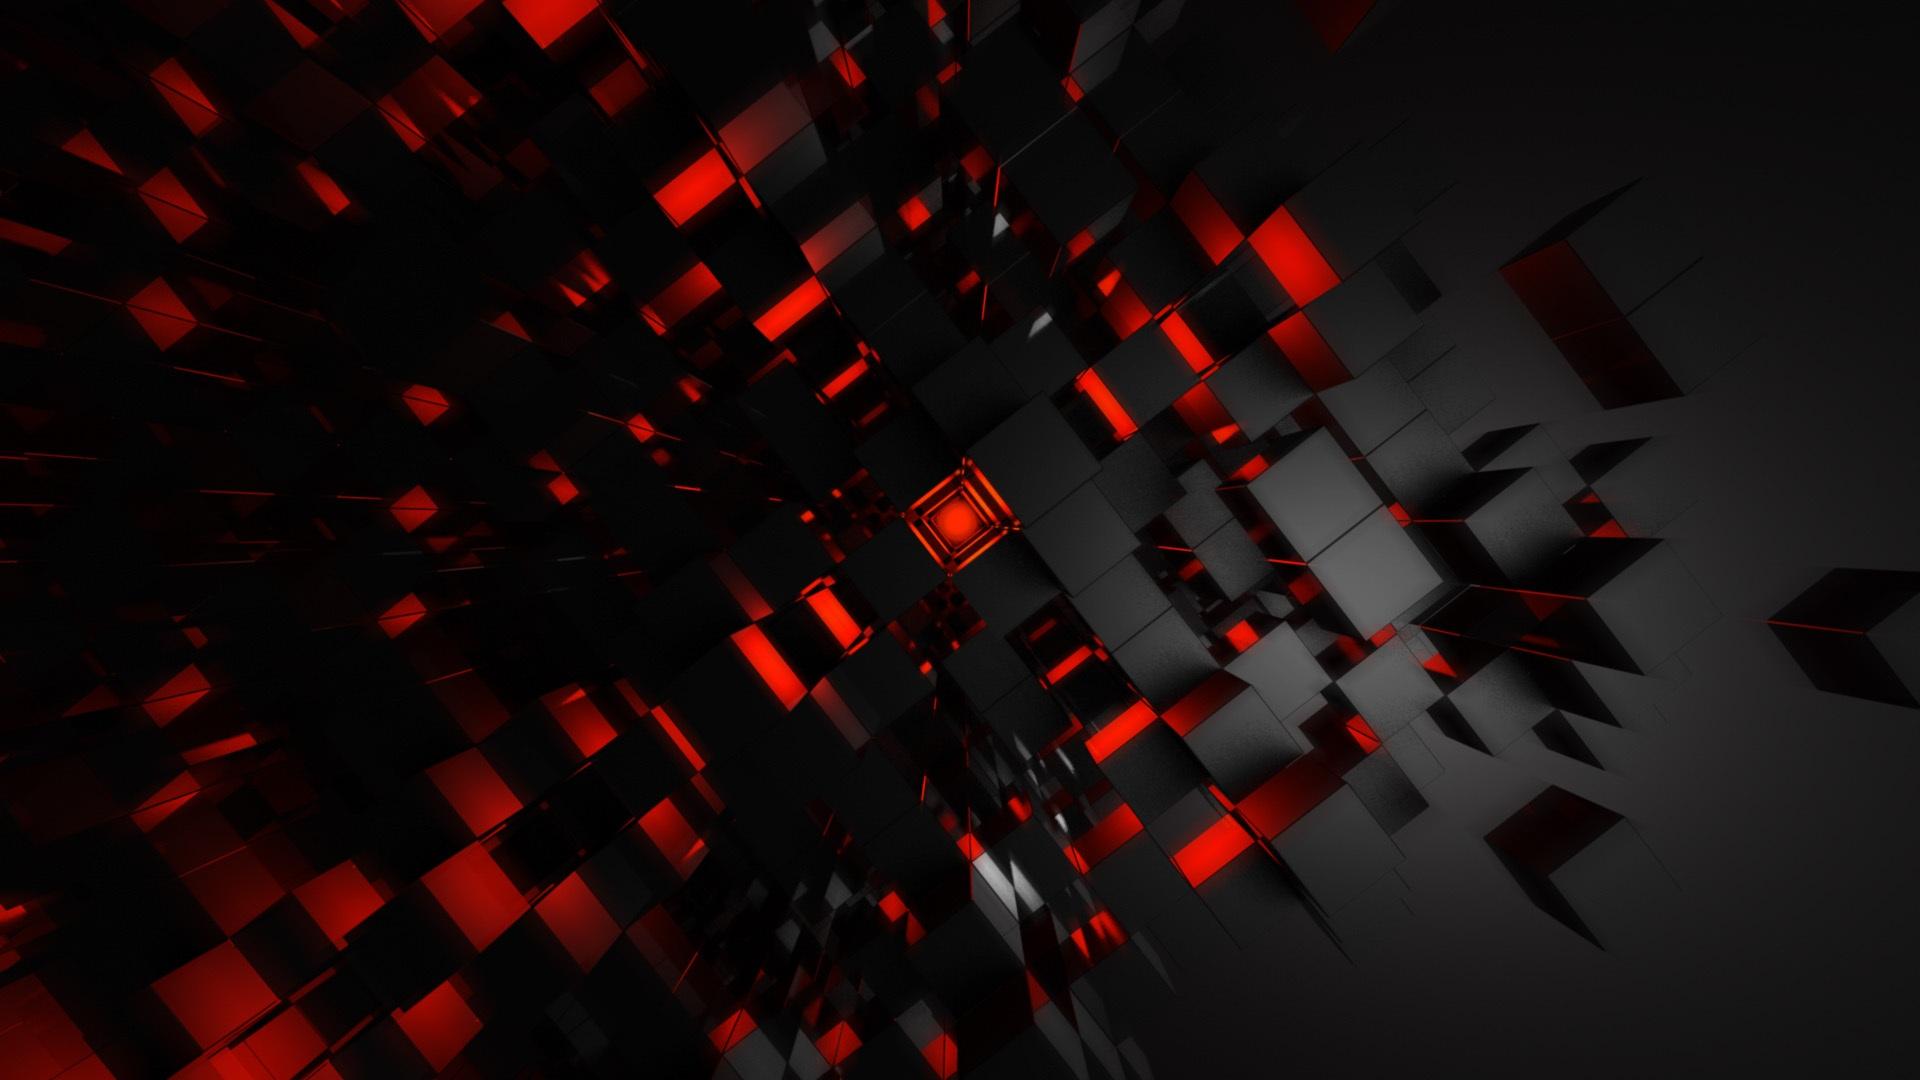 Fall Hipster Wallpapers Abstract Backgrounds Hd Pixelstalk Net